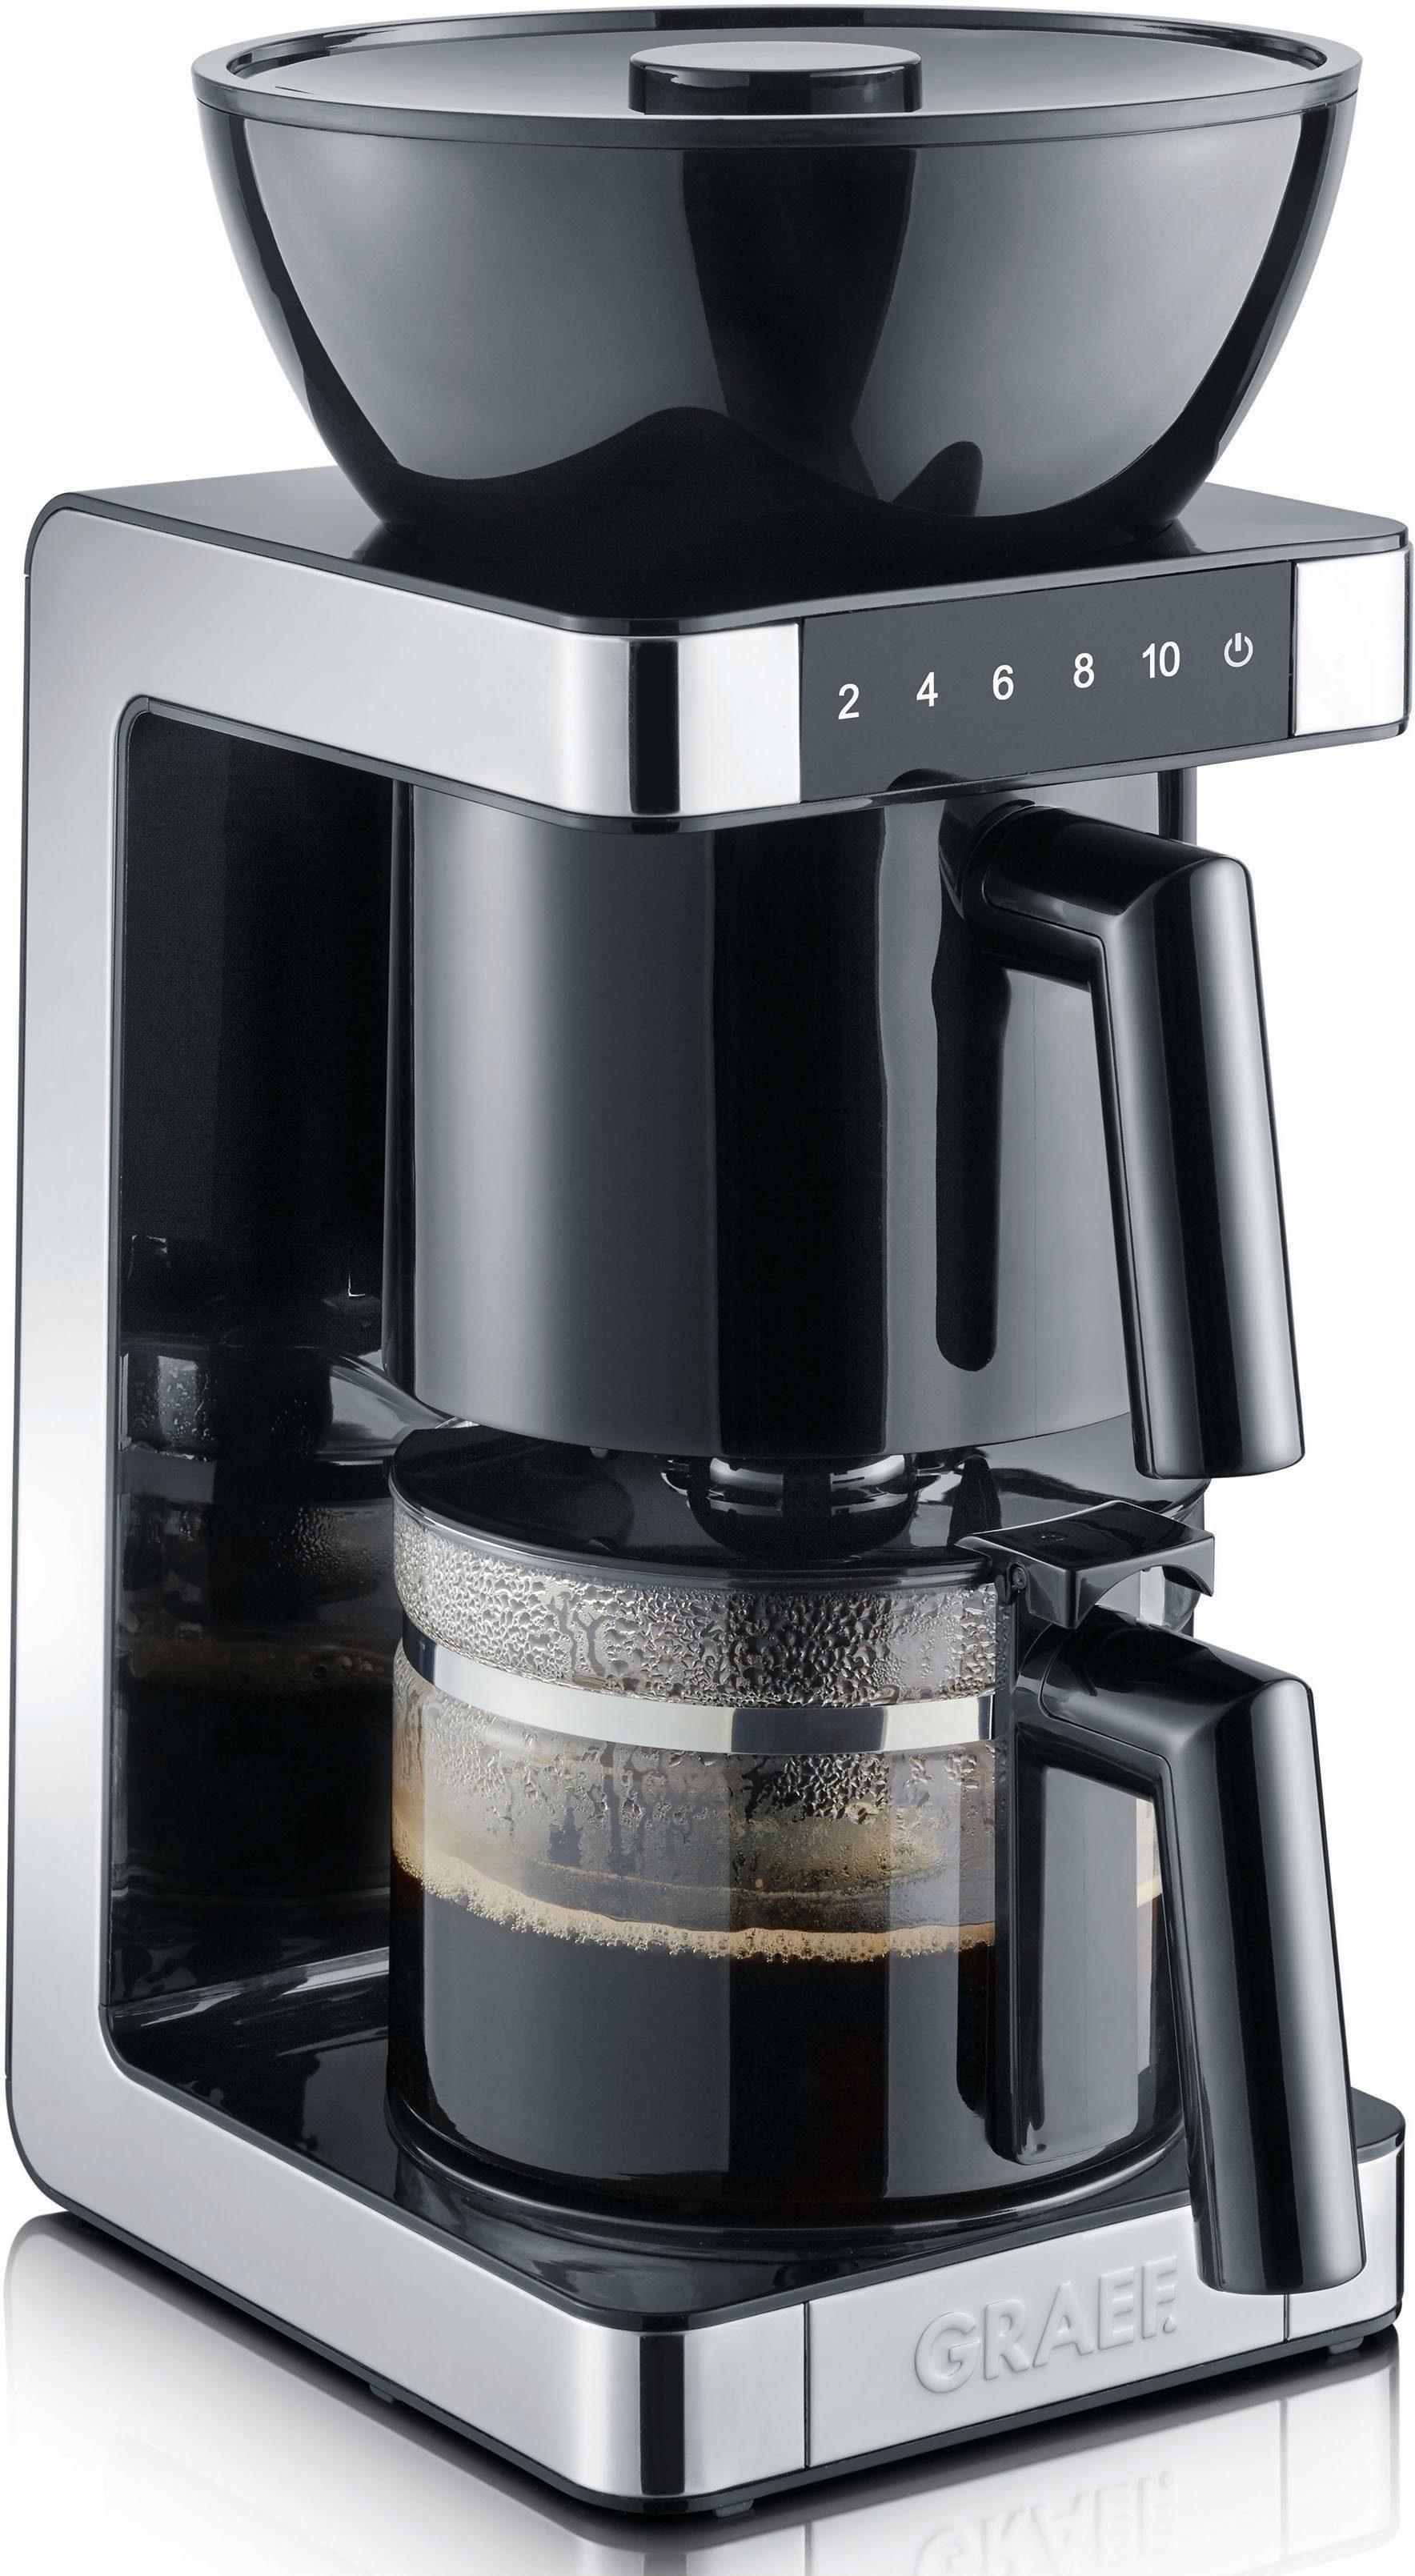 Graef Filterkaffeemaschine FK 702, 1,25l Kaffeekanne, Papierfilter 1x4